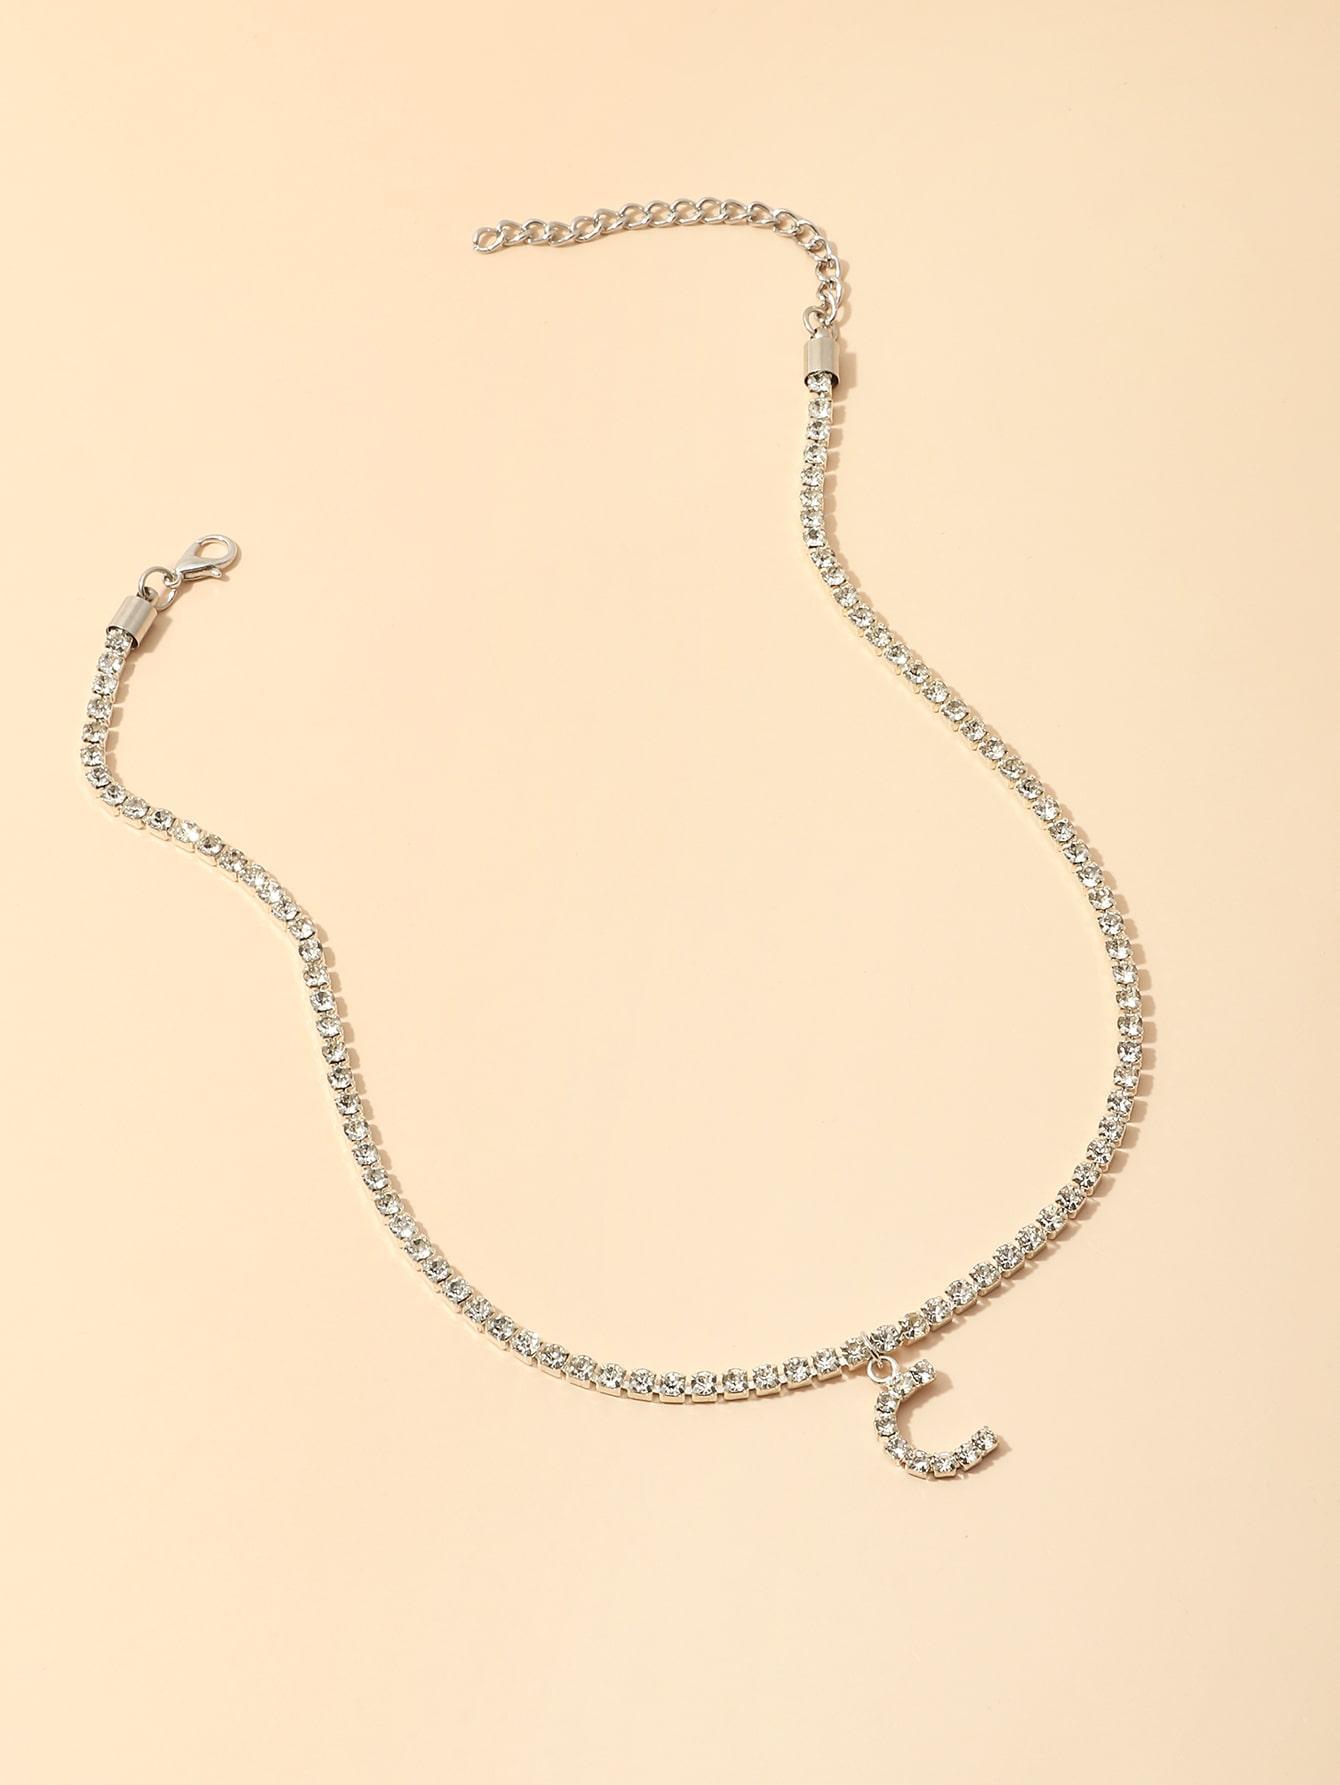 Rhinestone Decor Letter Charm Necklace thumbnail